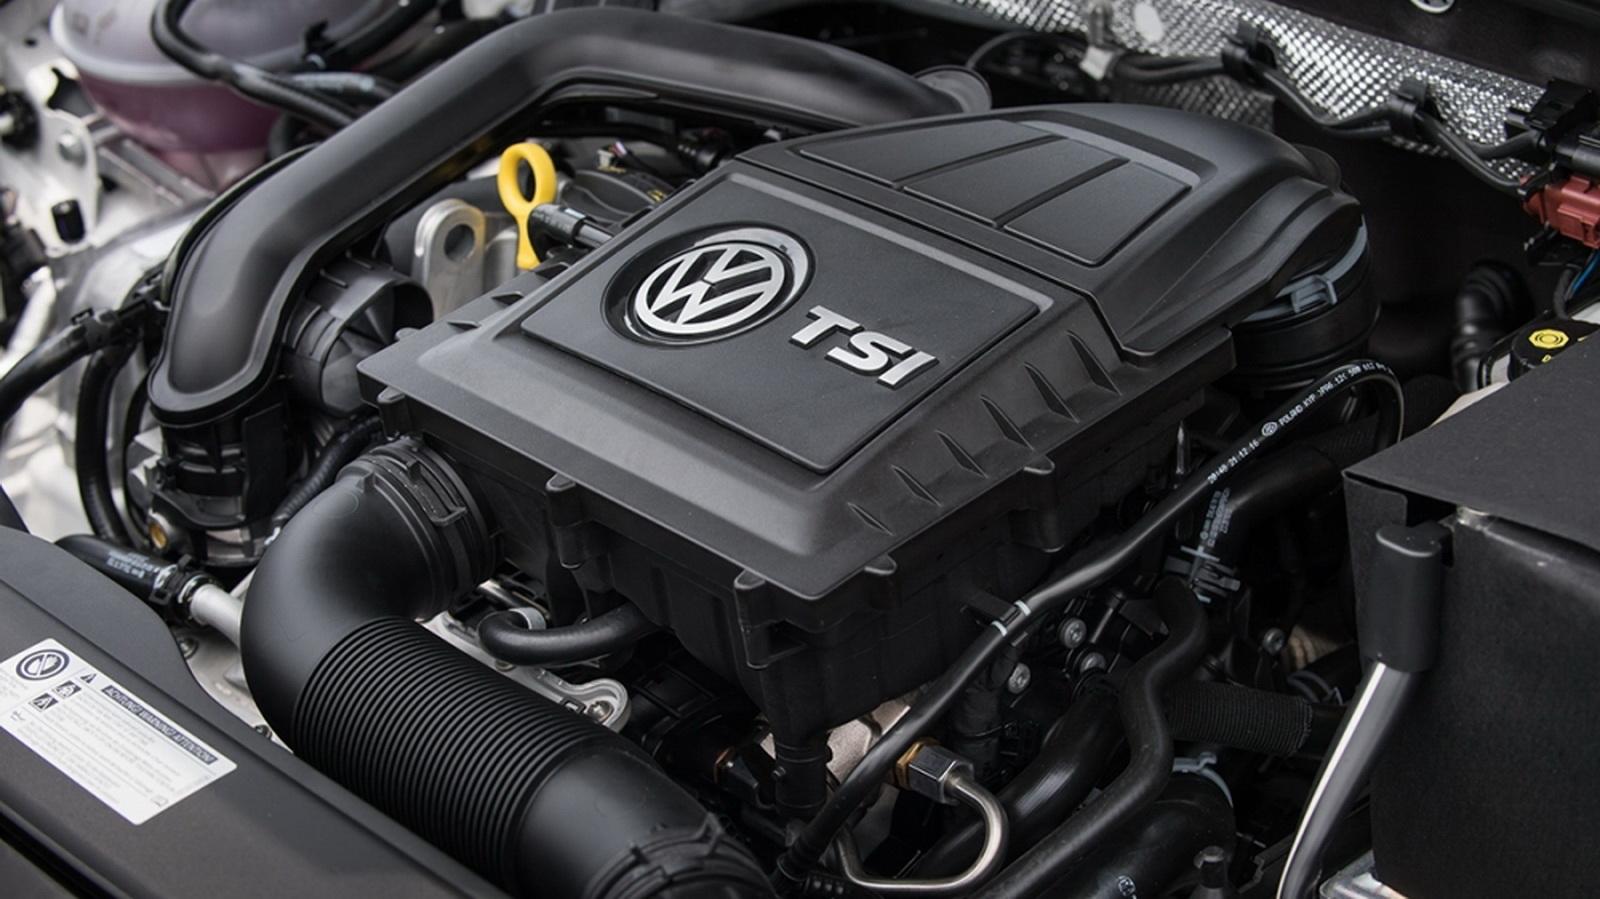 圖/2020 Volkswagen Polo 230 TSI Life搭載Volkswagen引以為傲的1.0升TSI三缸渦輪增壓引擎,能達到115hp最大馬力與20.4kgm扭力峰值。